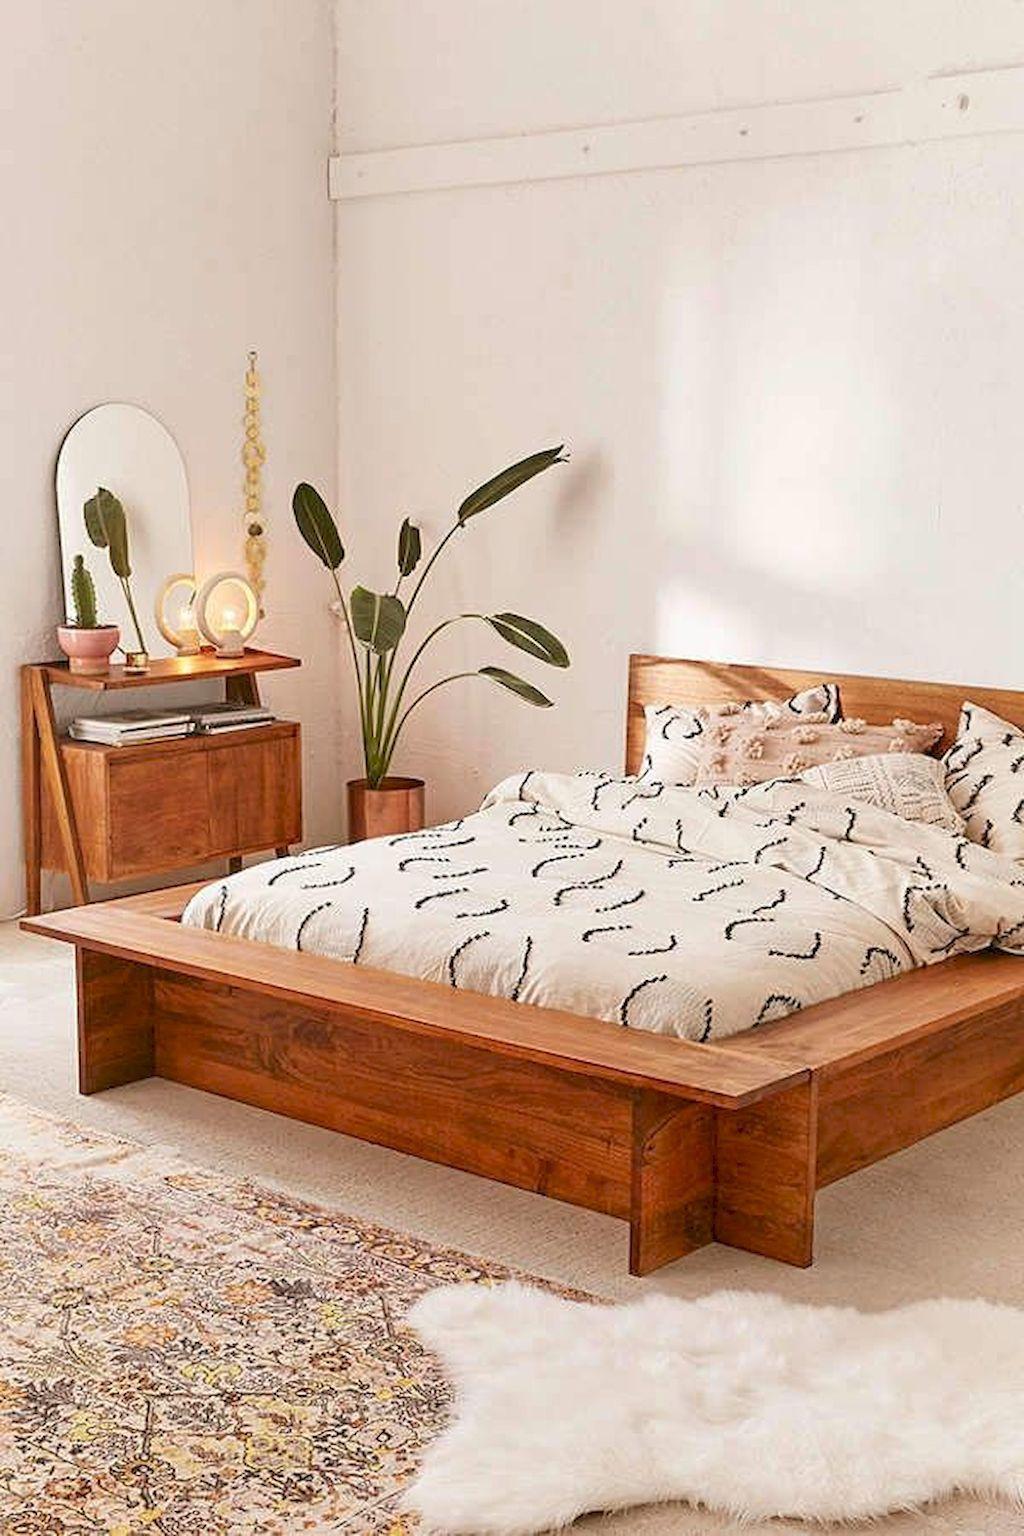 50 minimalist furniture ideas for 2019 furniture bedroom bed rh pinterest com